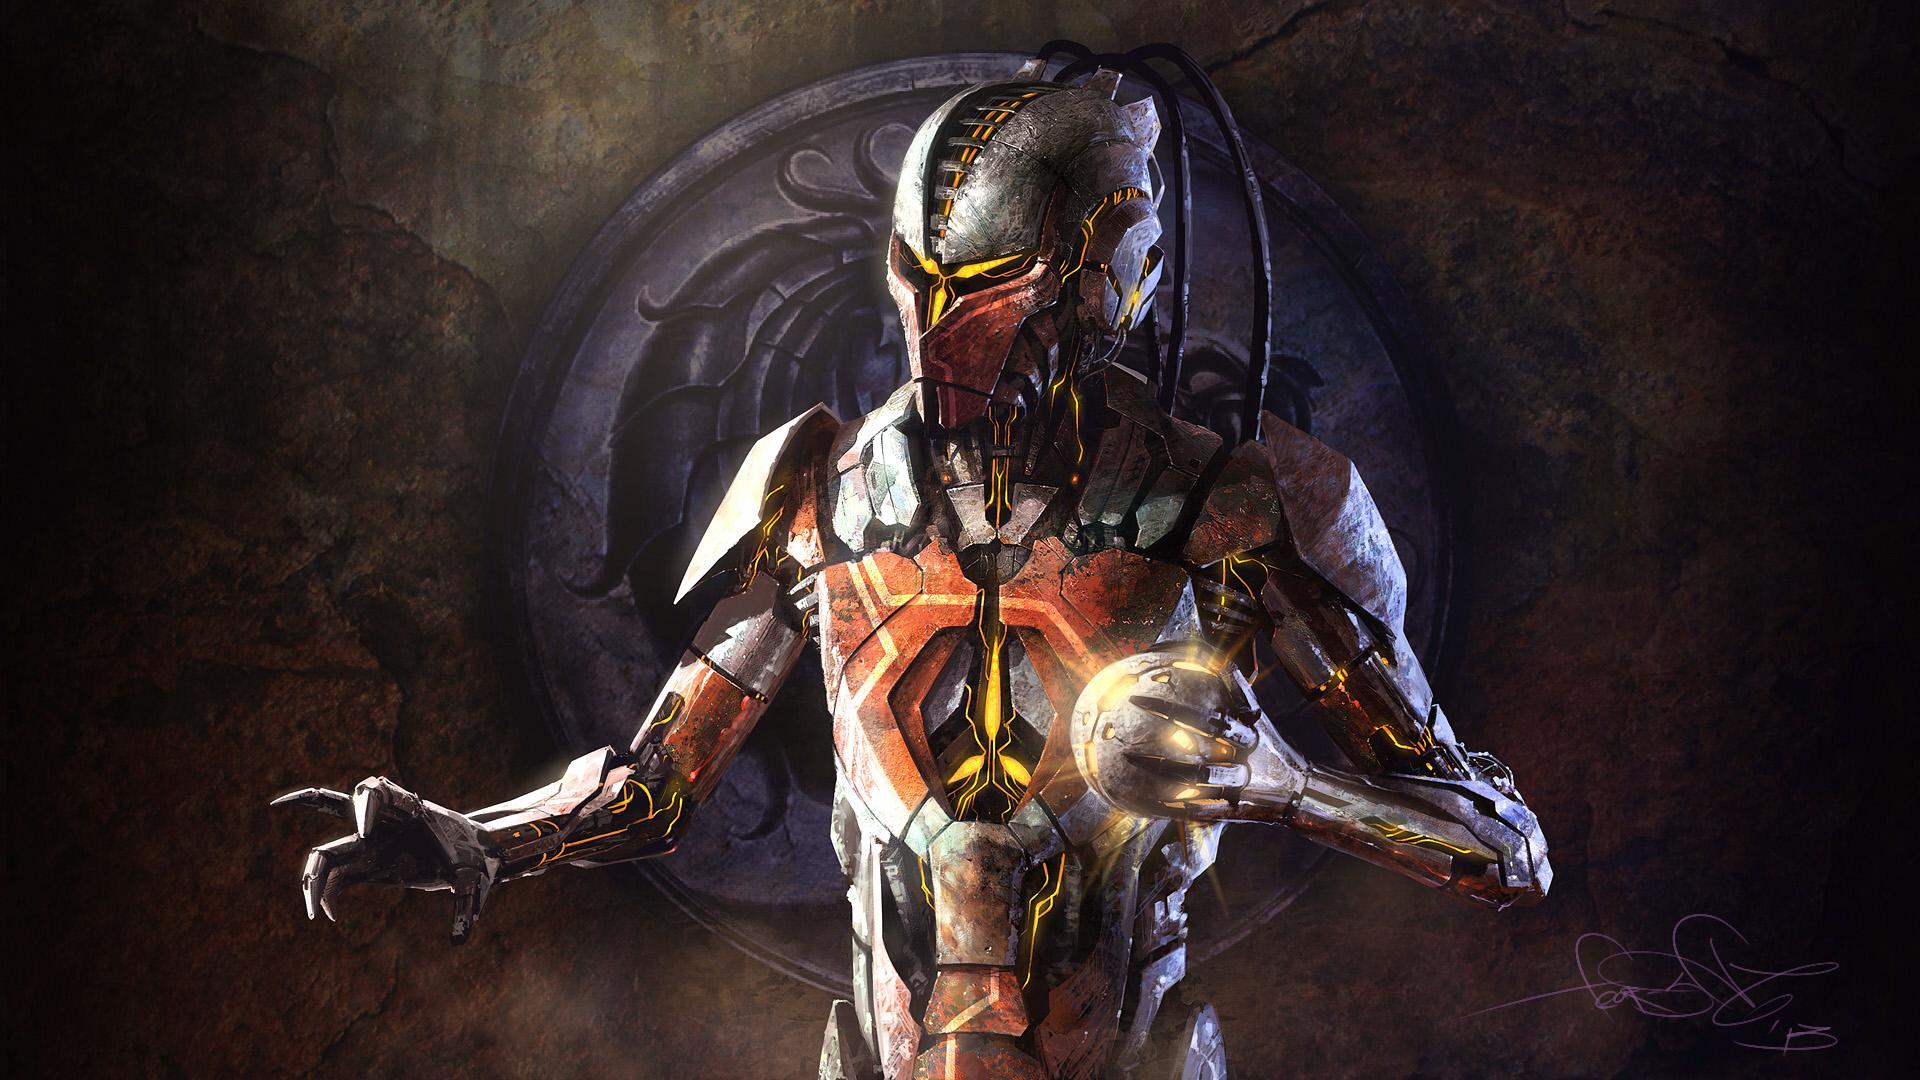 Sektor - Mortal Kombat art by fear-sAs ...